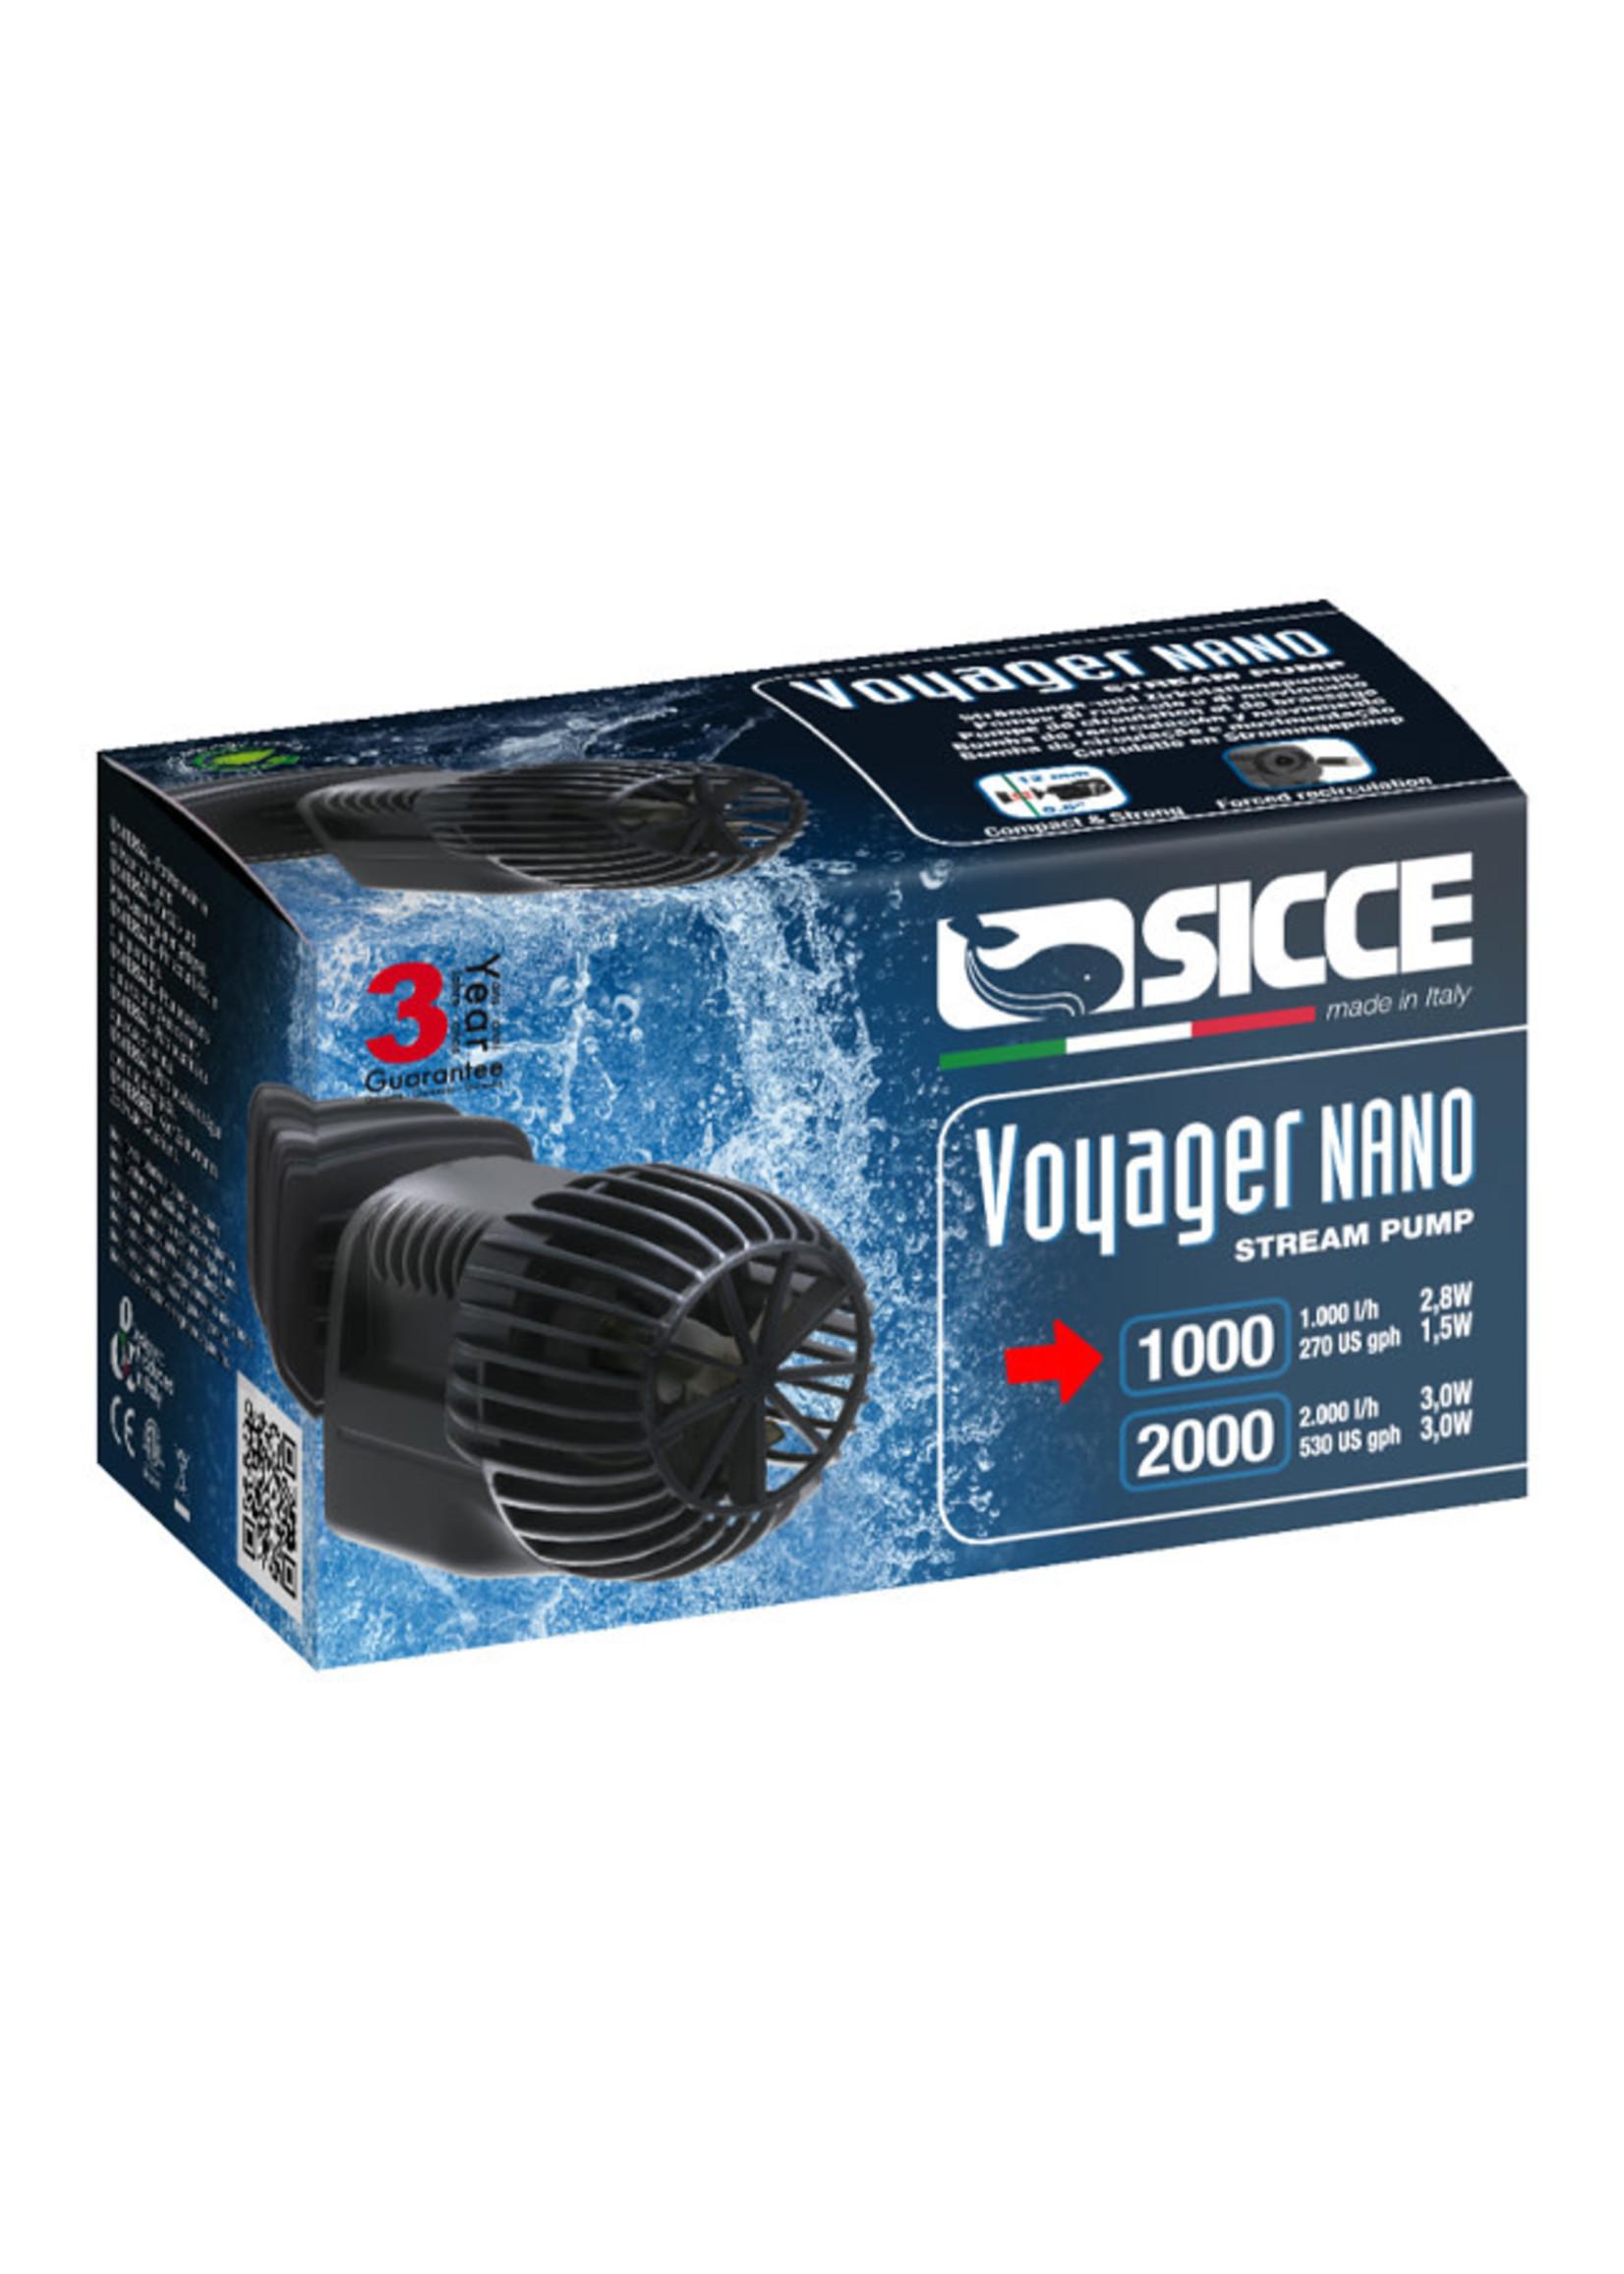 SICCE US, Inc. Sicce Voyager Nano Stream Pump 1000, 270gph